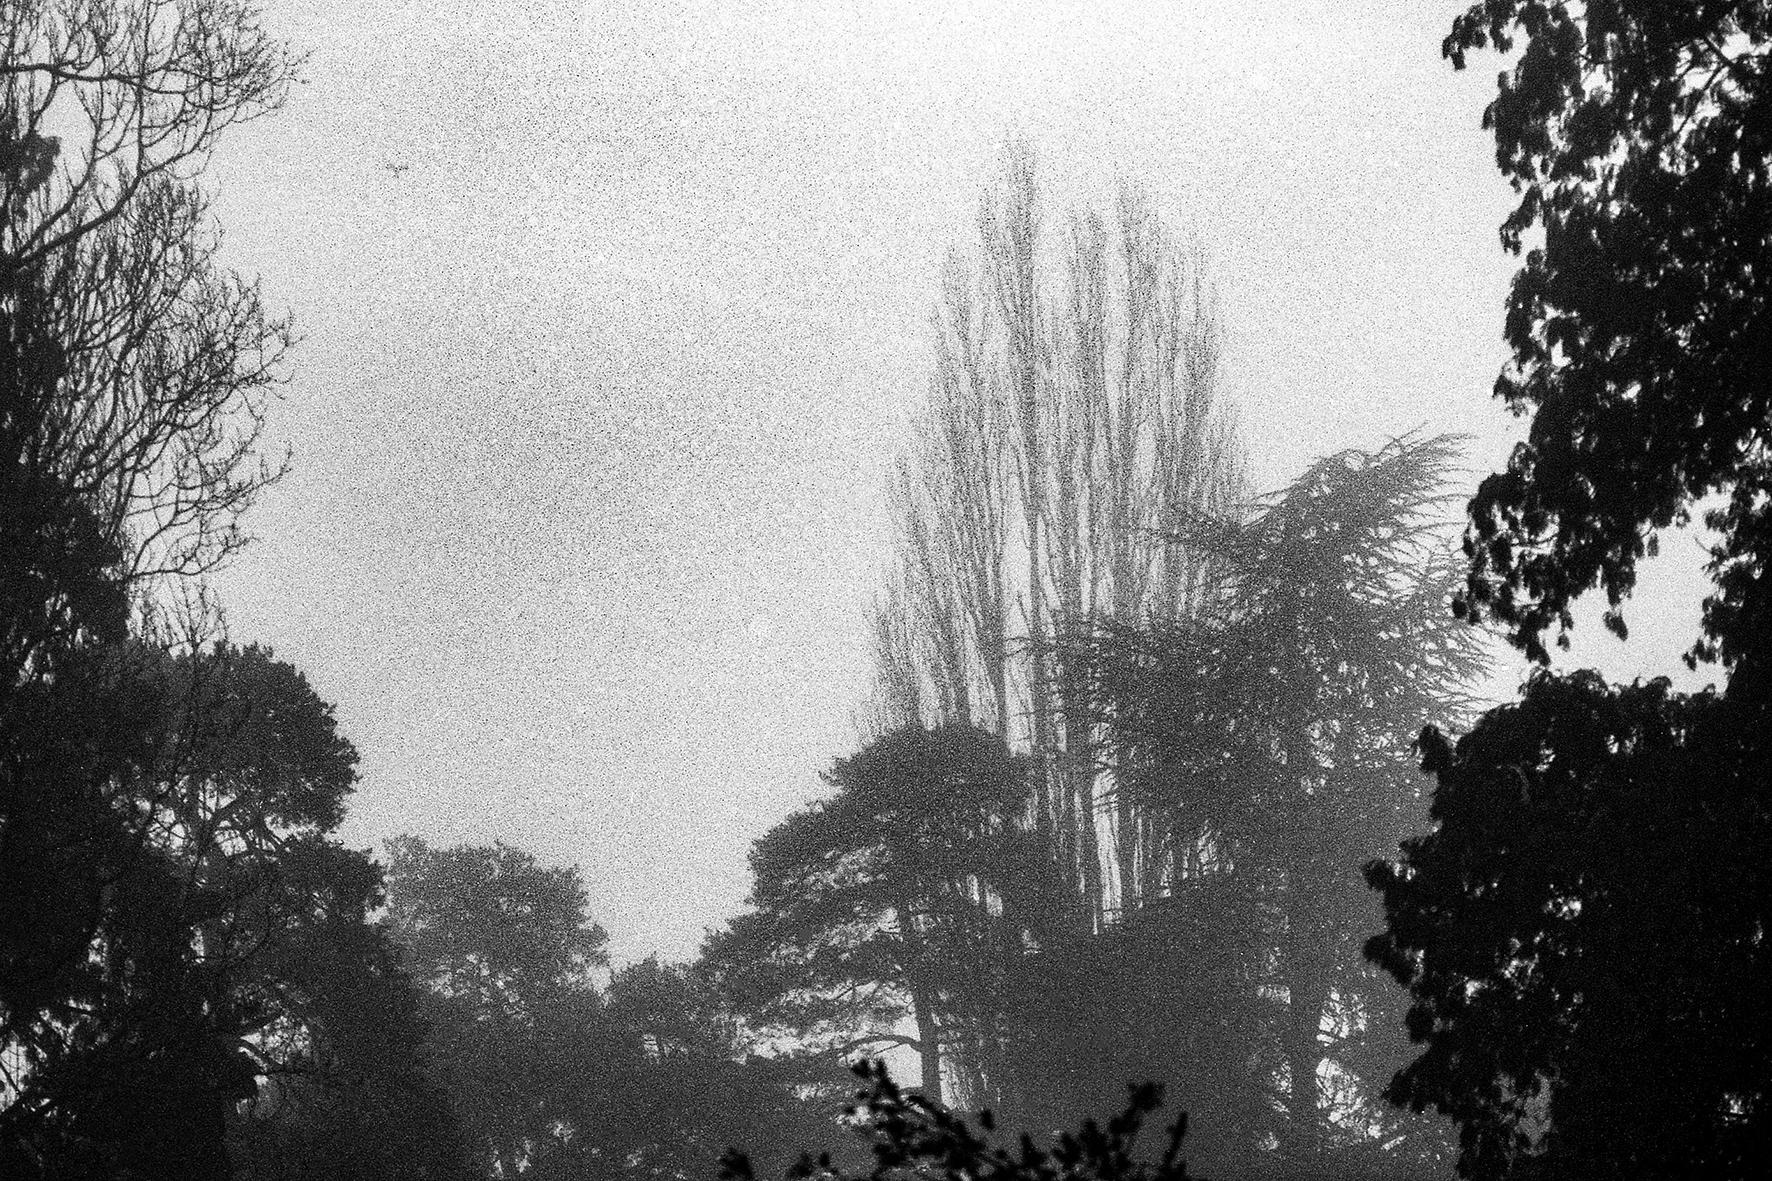 Photographe : Le graphisme naturel n°18